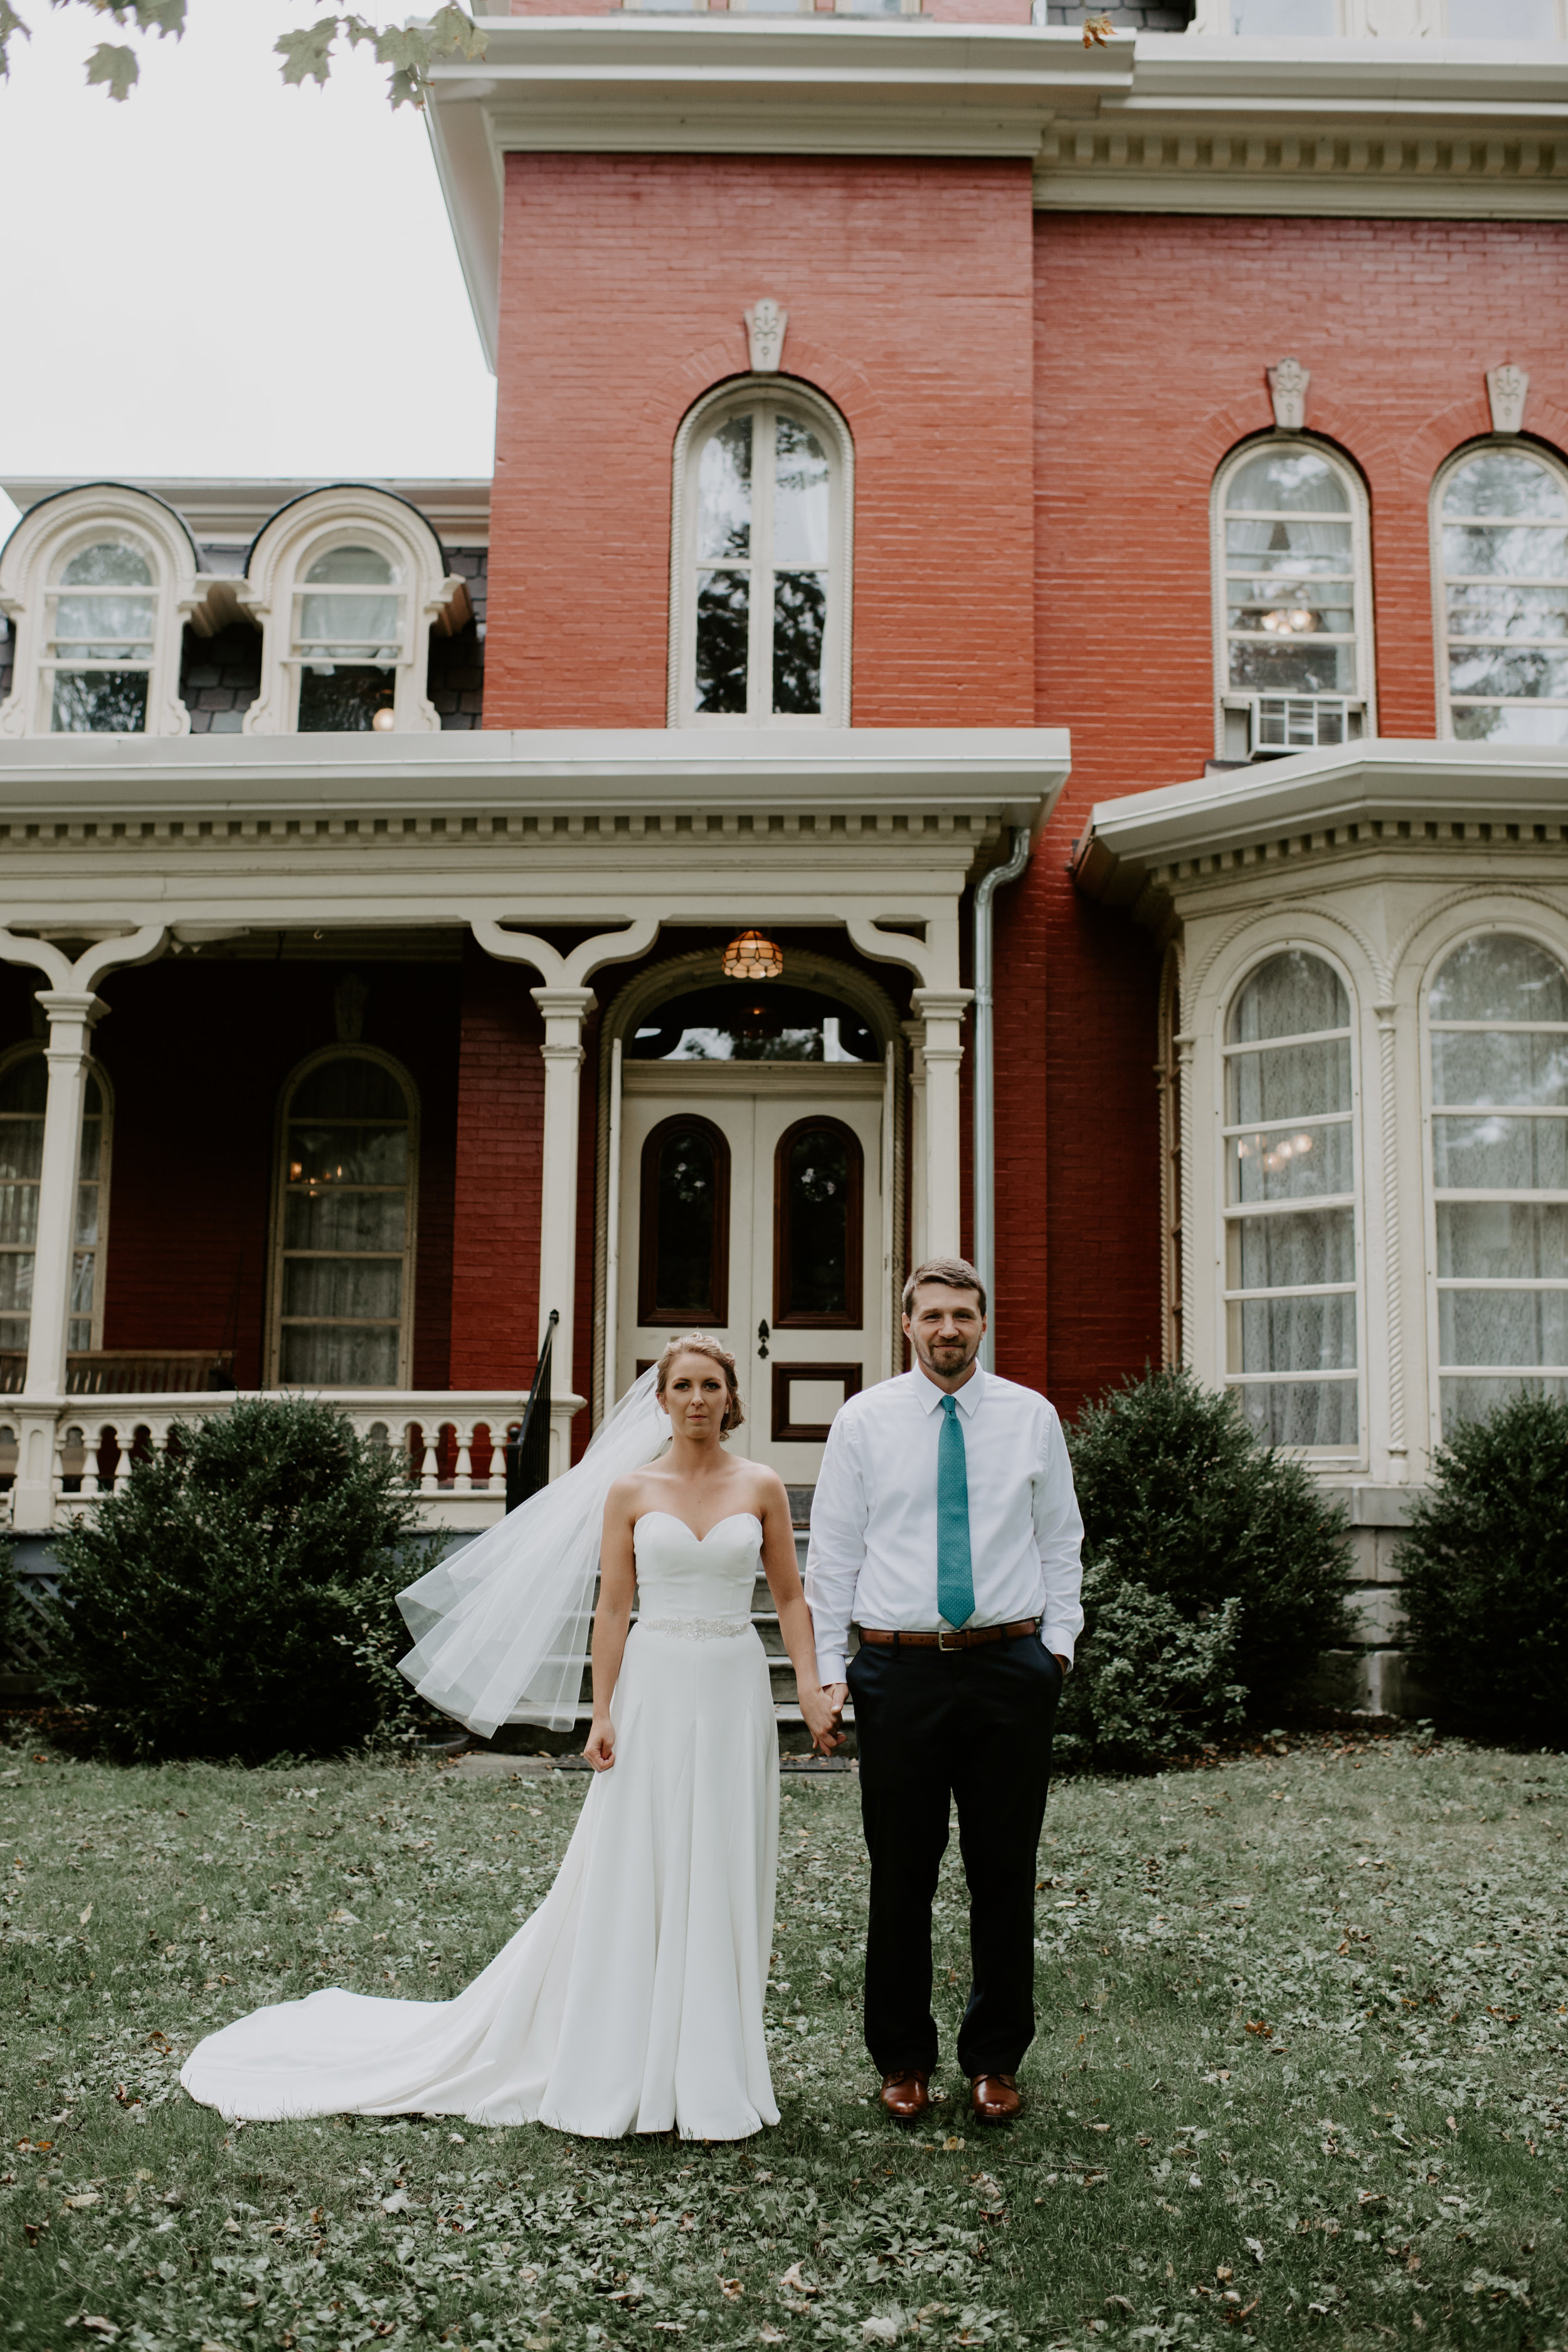 APD_chris_justin_wedding-212 copy.jpg